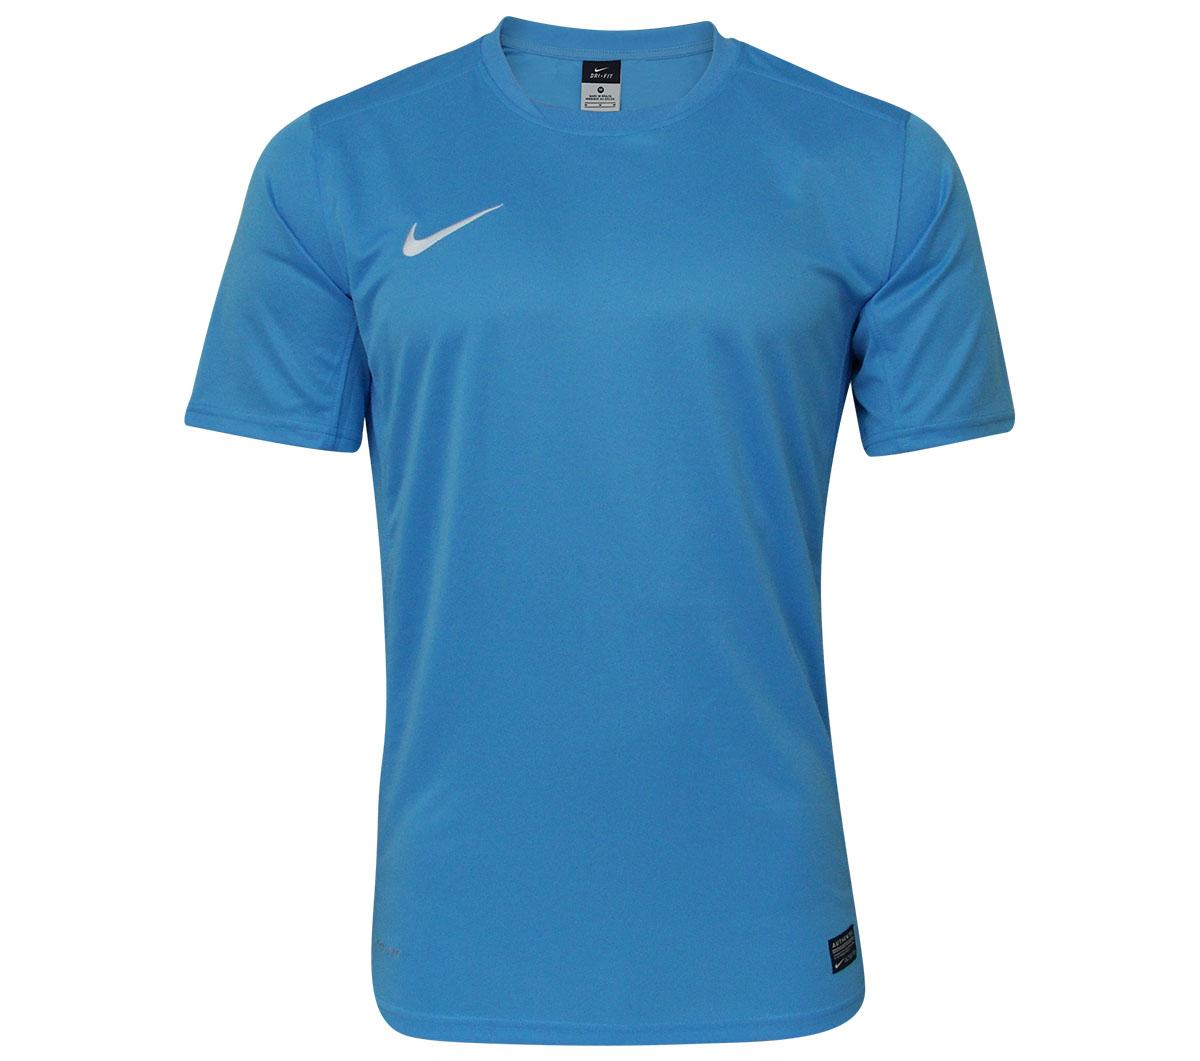 661ce8d0abcfa Camisa Nike Park V Celeste Camisa Nike Park V Celeste ...